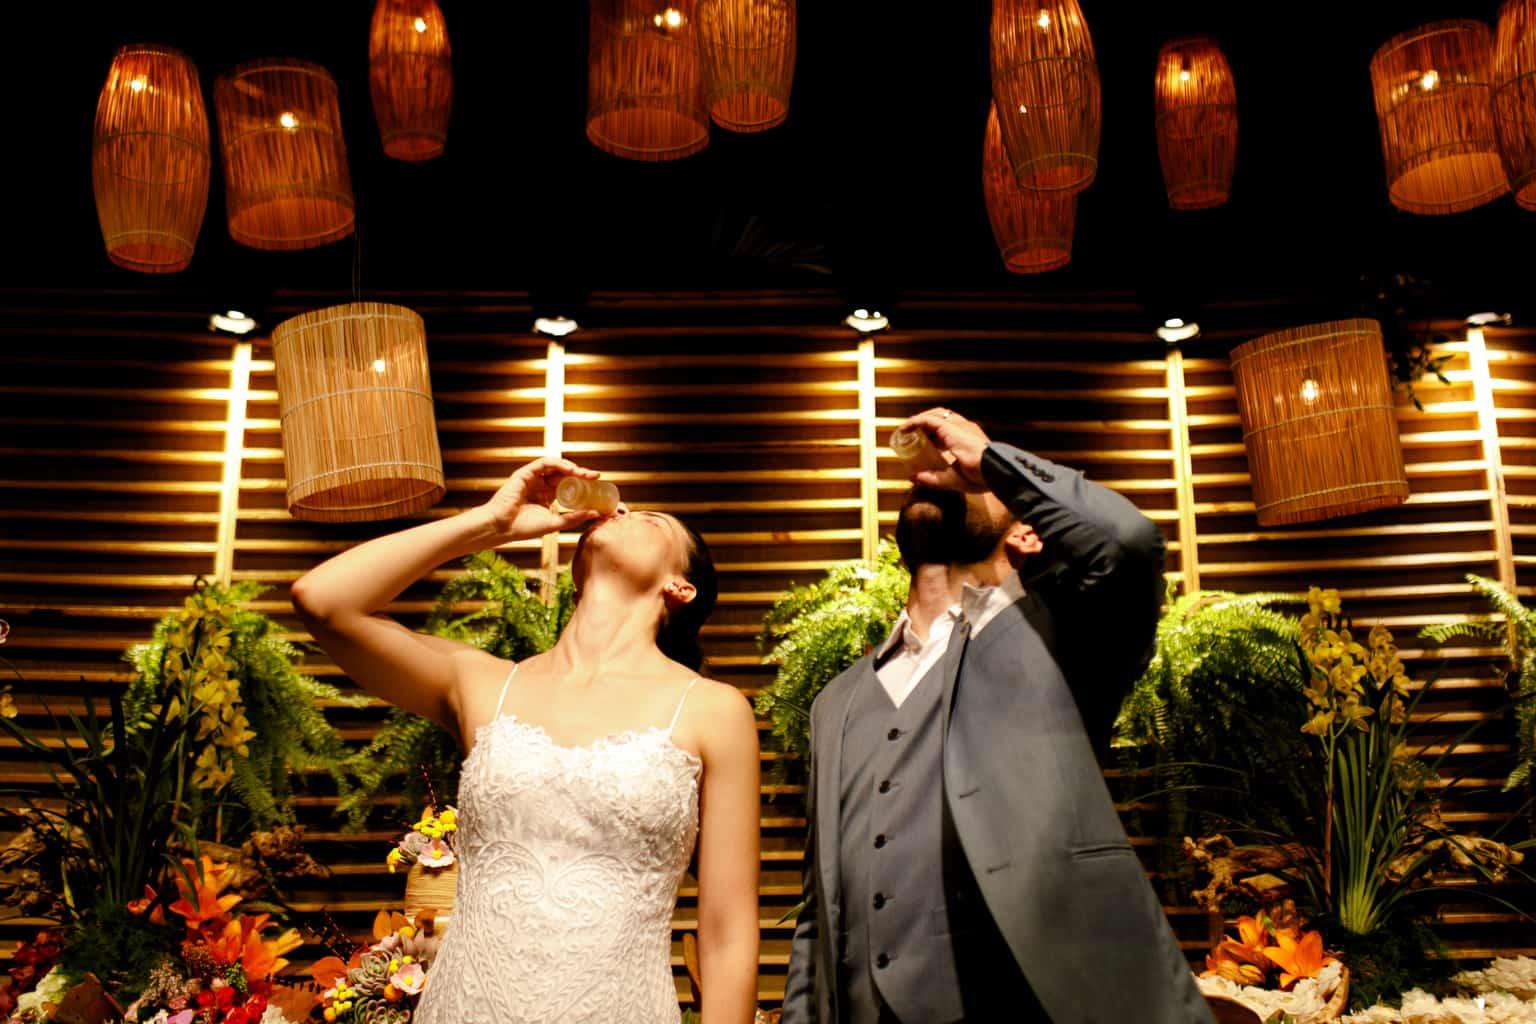 Casamento-Emanuelle-e-Alysson-Fotografia-Tadeu-Nanó-e-Luca-Antunes144